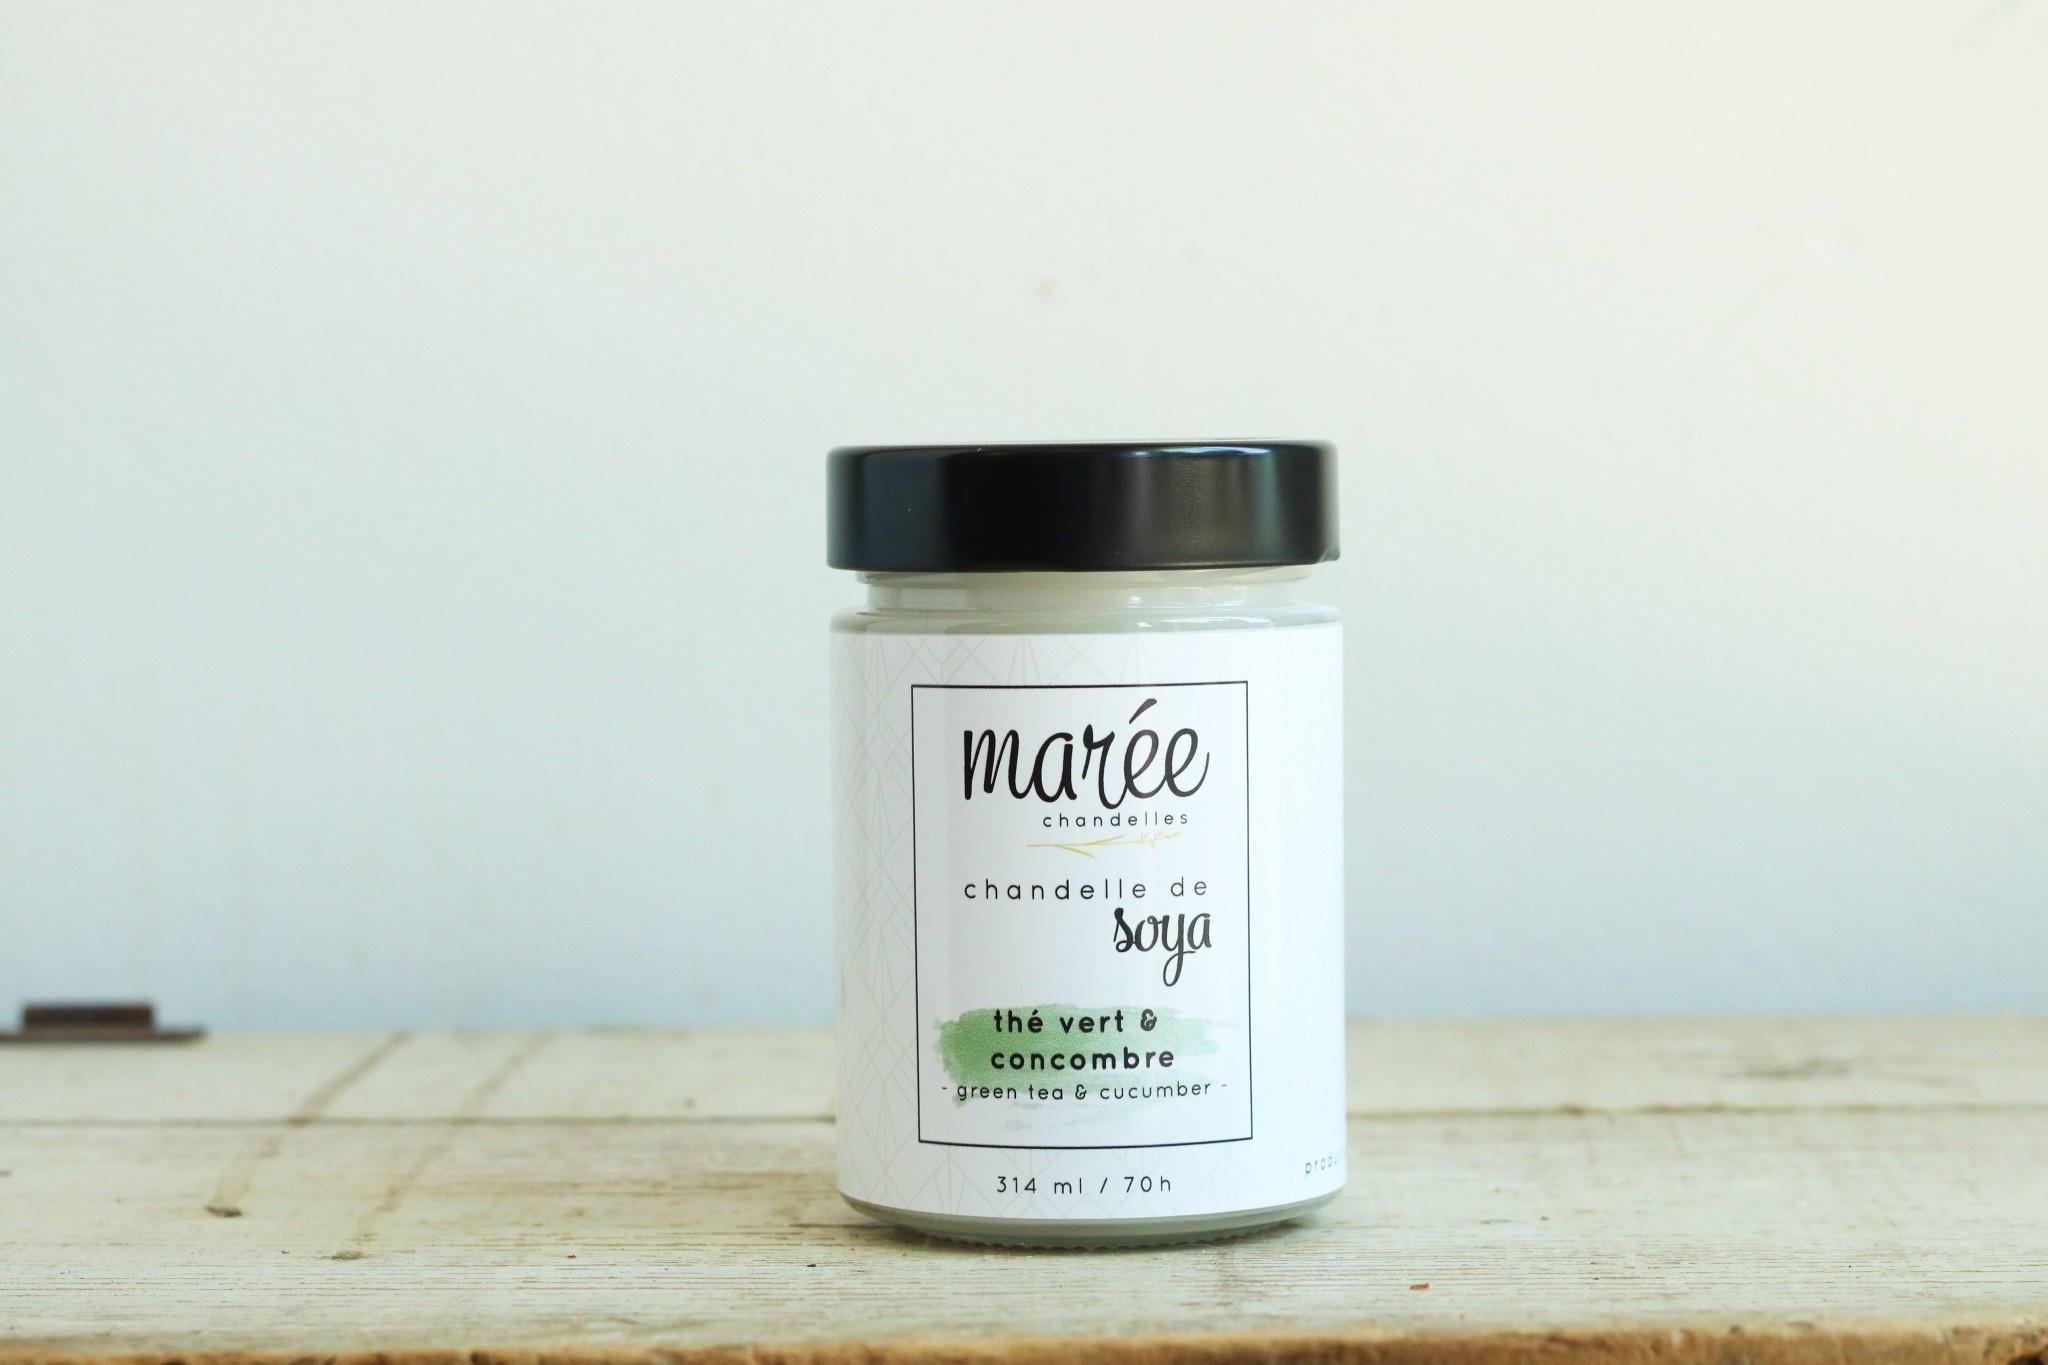 Marée chandelles MARÉE CHANDELLES: Chandelle de soya Thé vert & concombre (314ml)